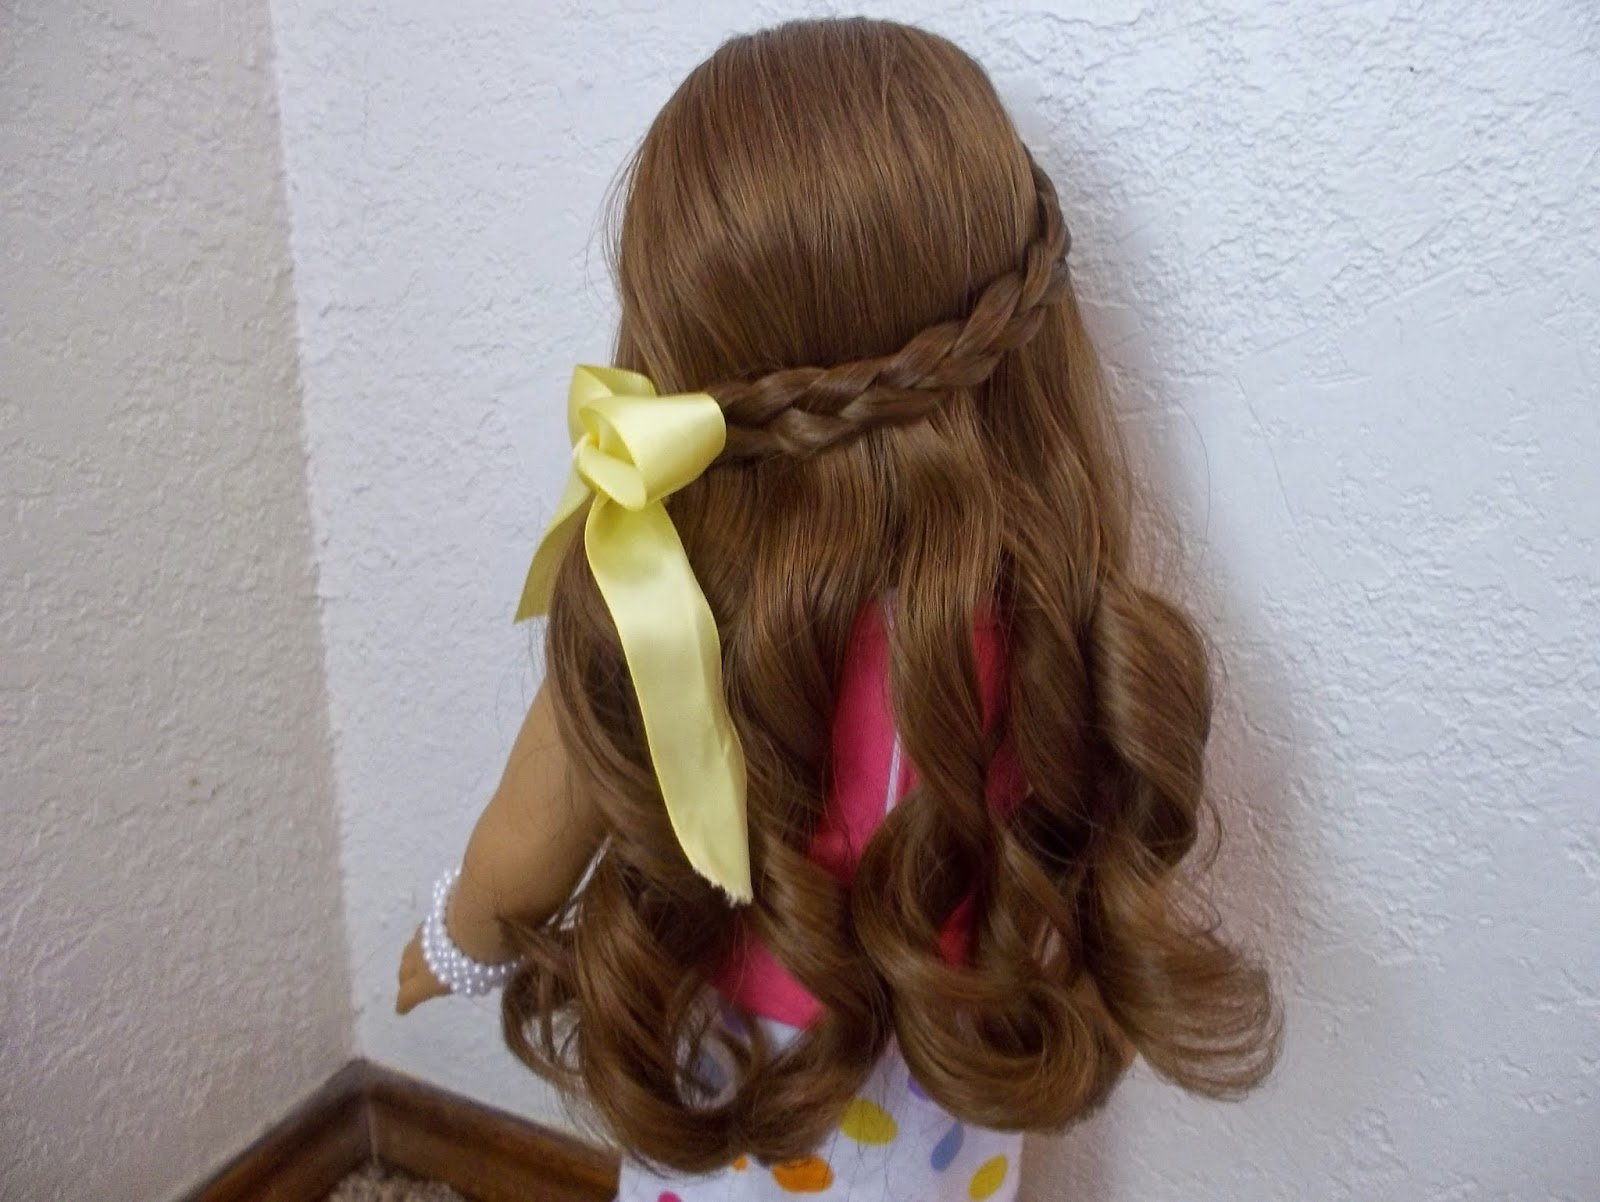 Tremendous Cute American Girl Doll Hairstyles Trends Hairstyle Short Hairstyles Gunalazisus